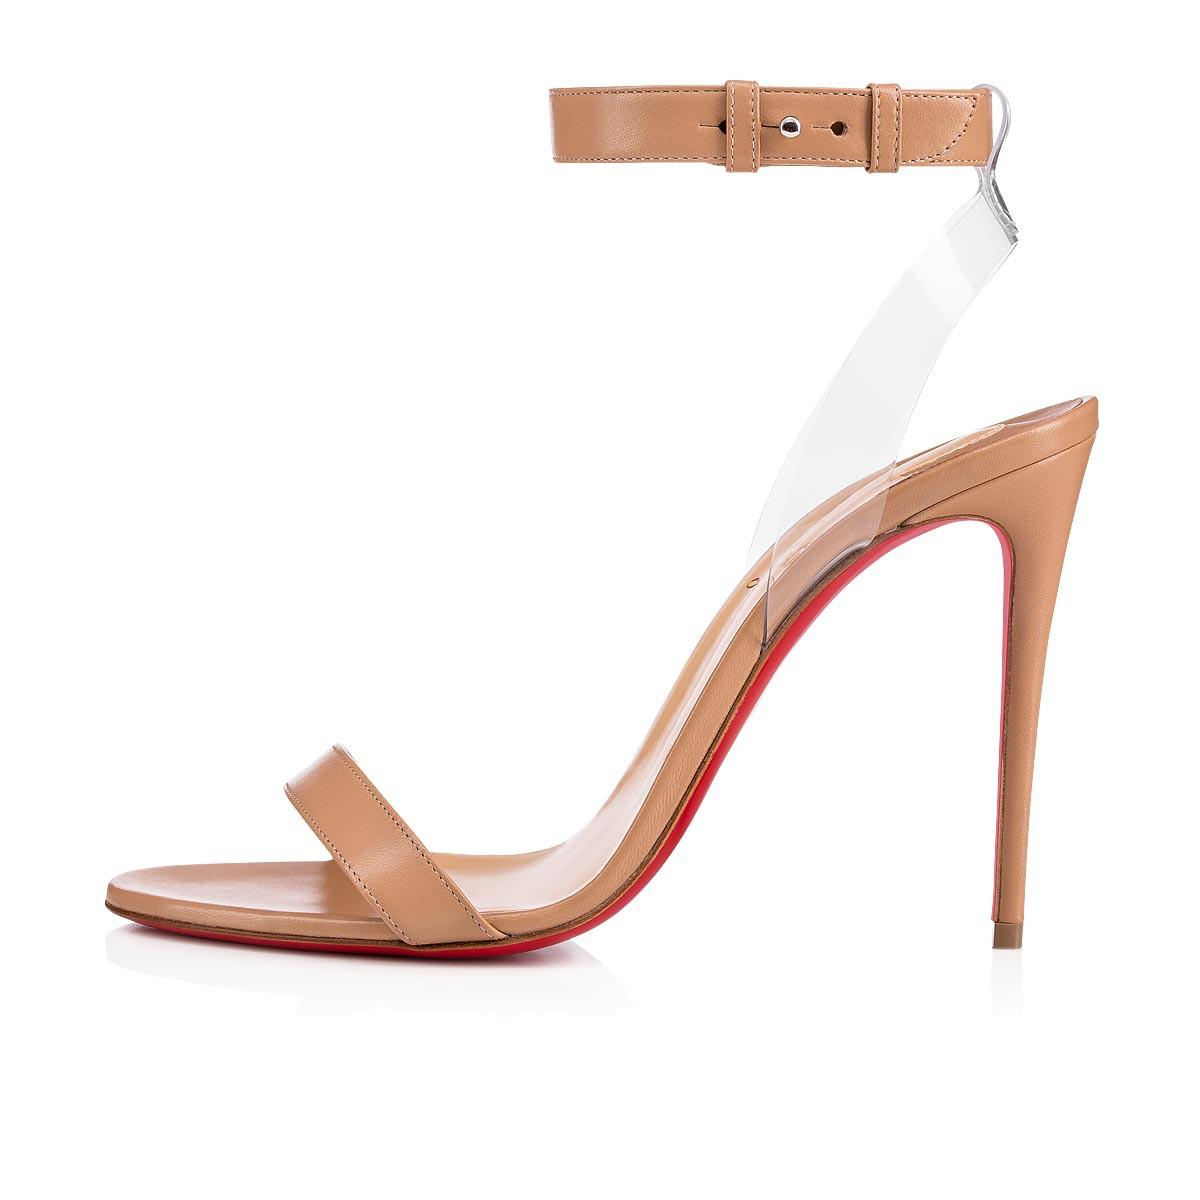 watch 0bea4 95d7e Jonatina 100 Nude/Transp Leather - Women Shoes - Christian Louboutin